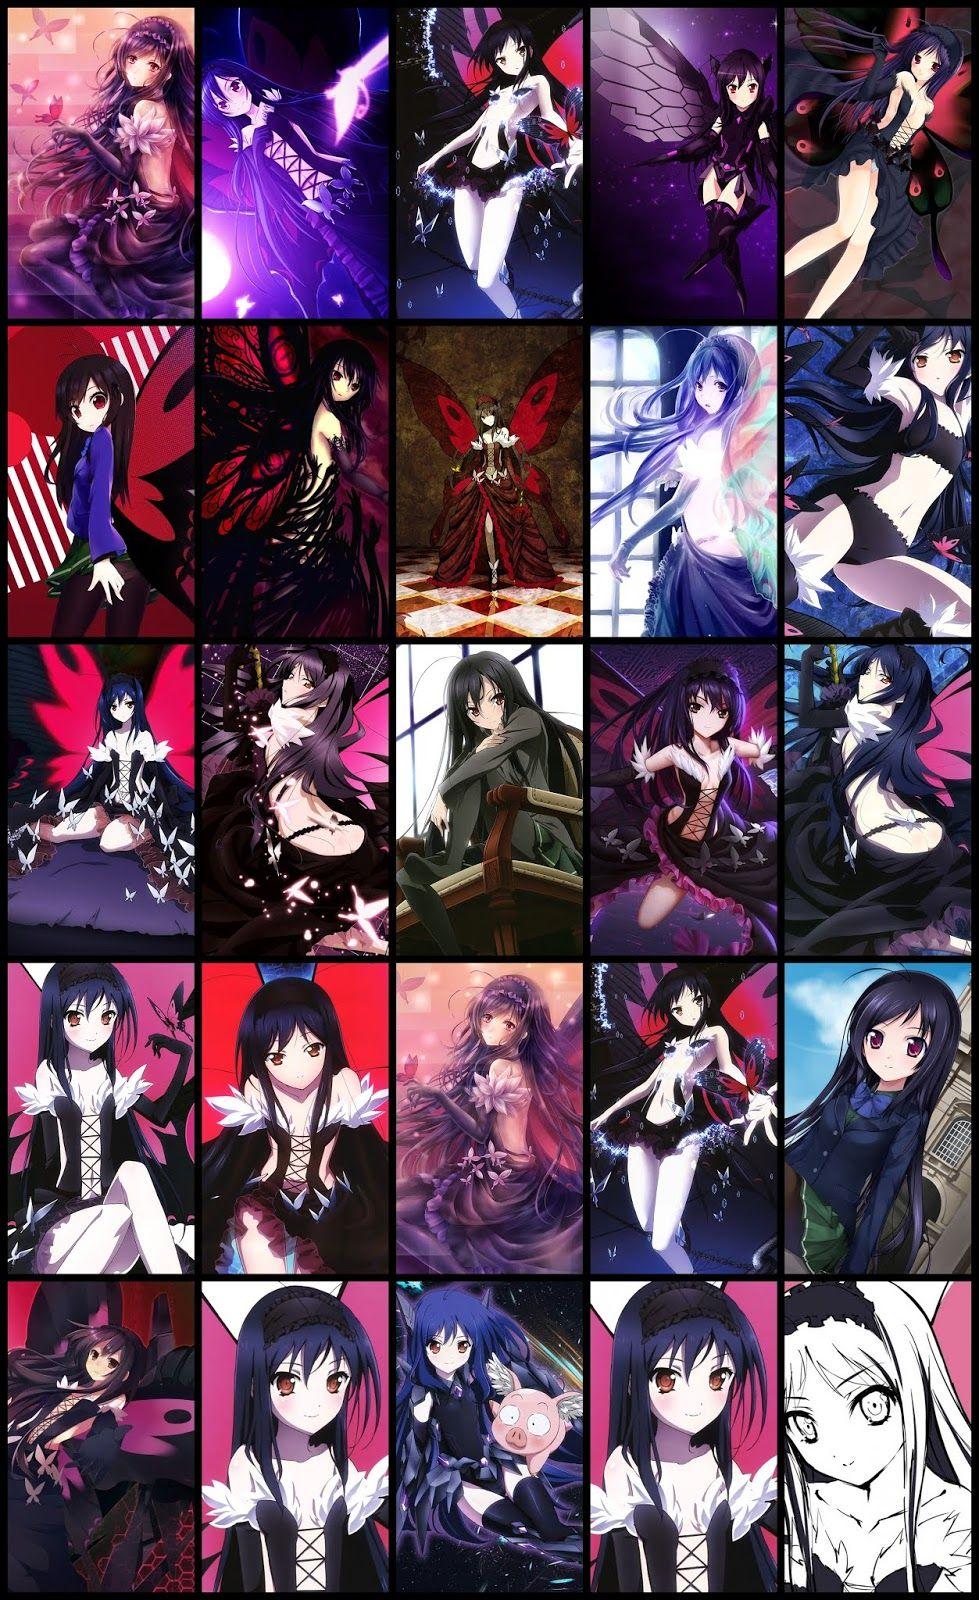 Accel World Wallpaper Pack Part 01 World Wallpaper Anime Wallpaper Wallpapers Anime Anime hd wallpaper pack